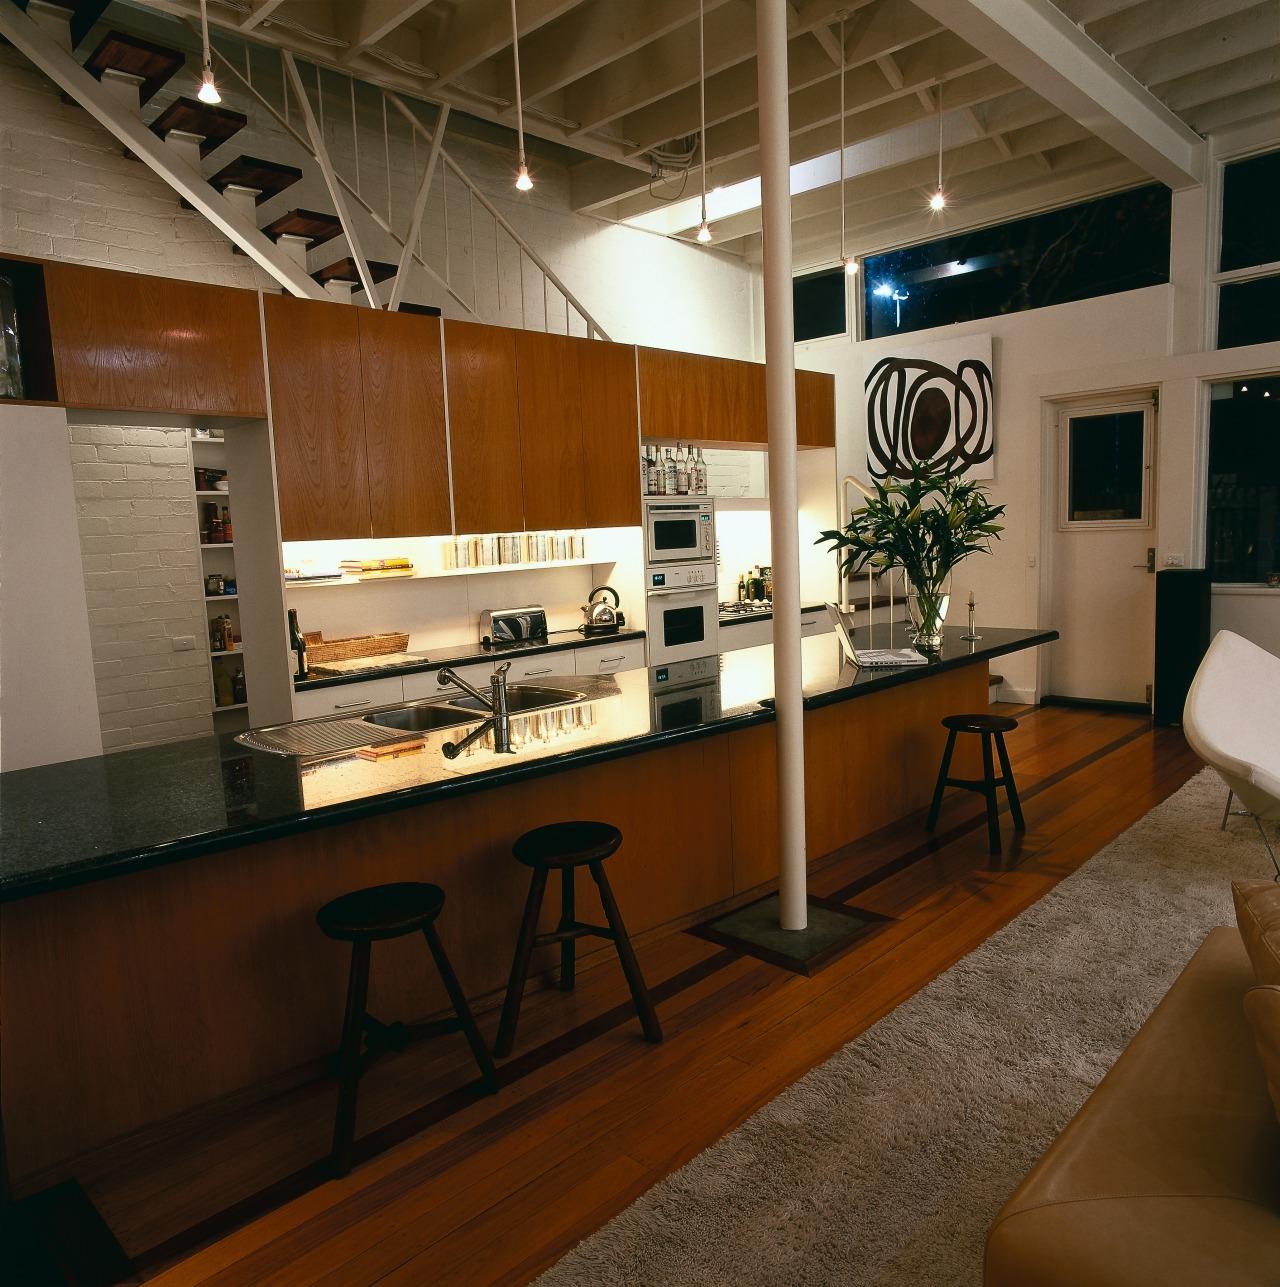 View of the kitchen area furniture, interior design, brown